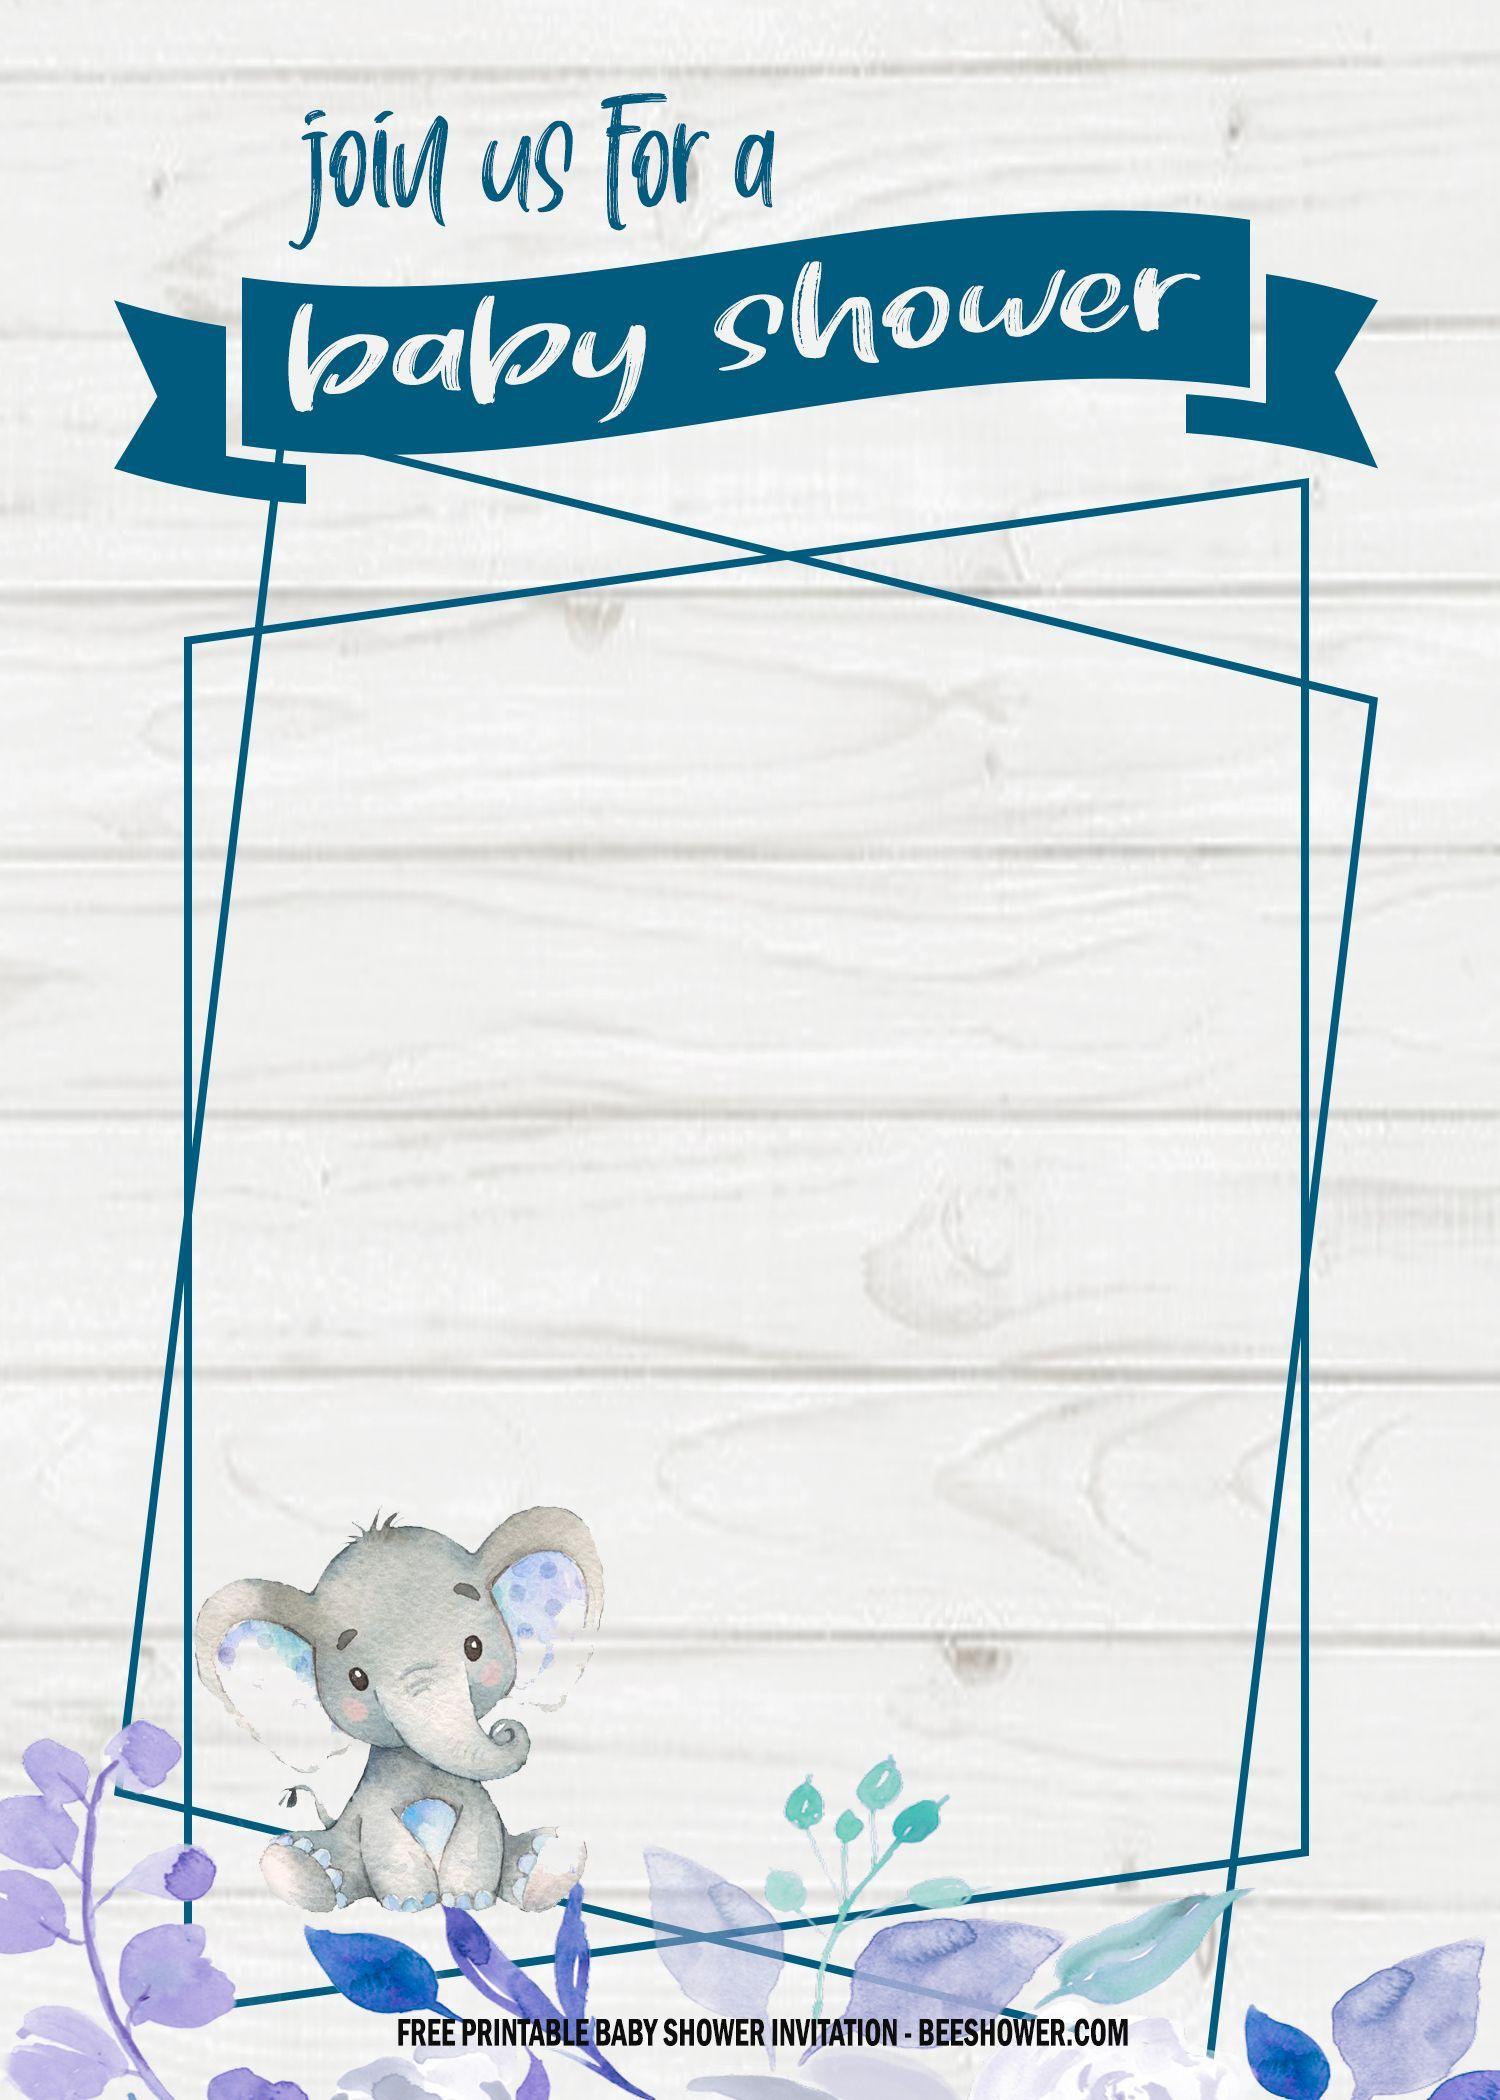 006 Stirring Free Baby Shower Printable Elephant Highest Clarity  DecorationFull